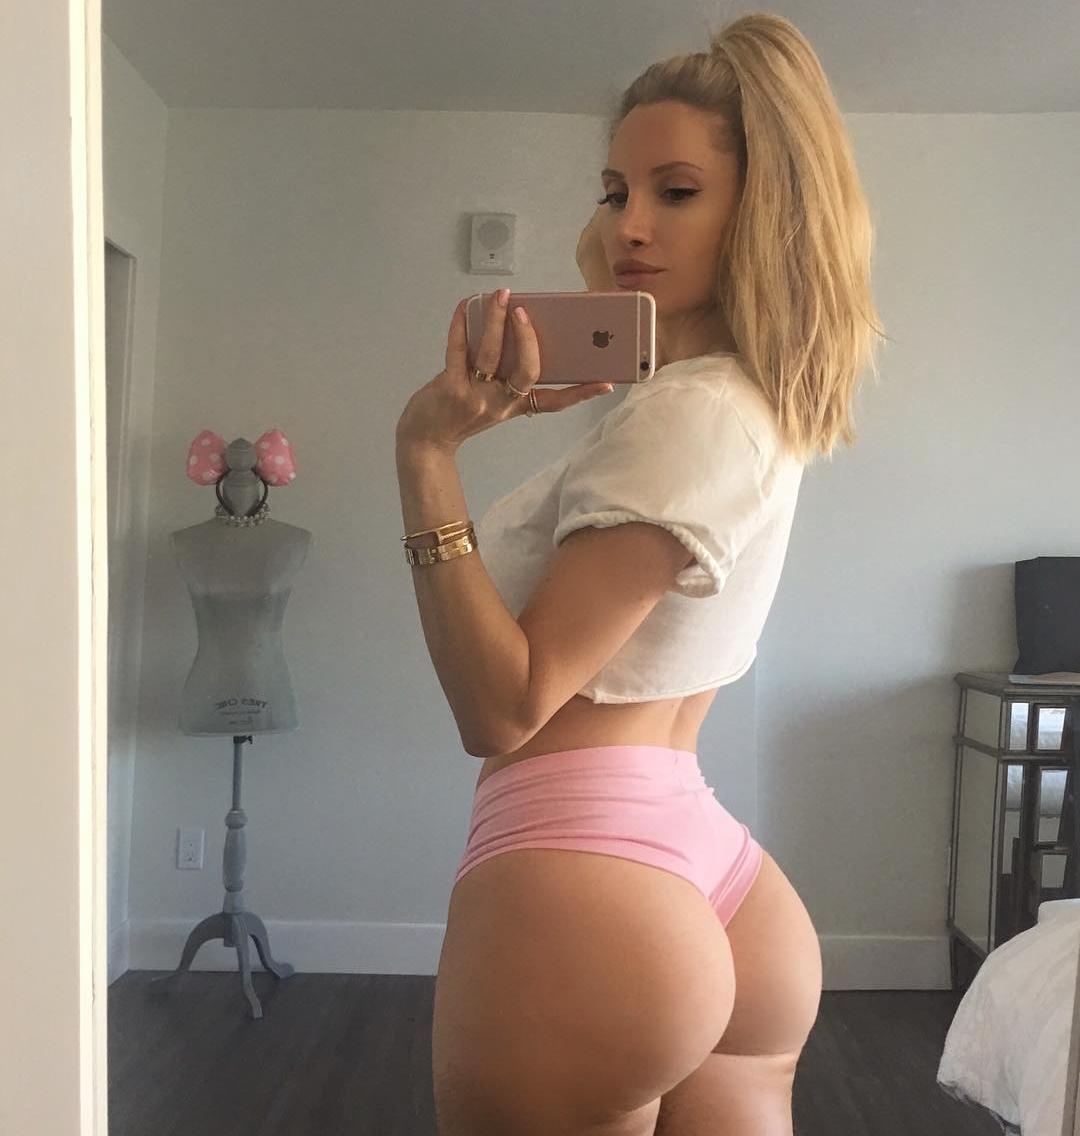 Selfie Amanda Lee nude photos 2019